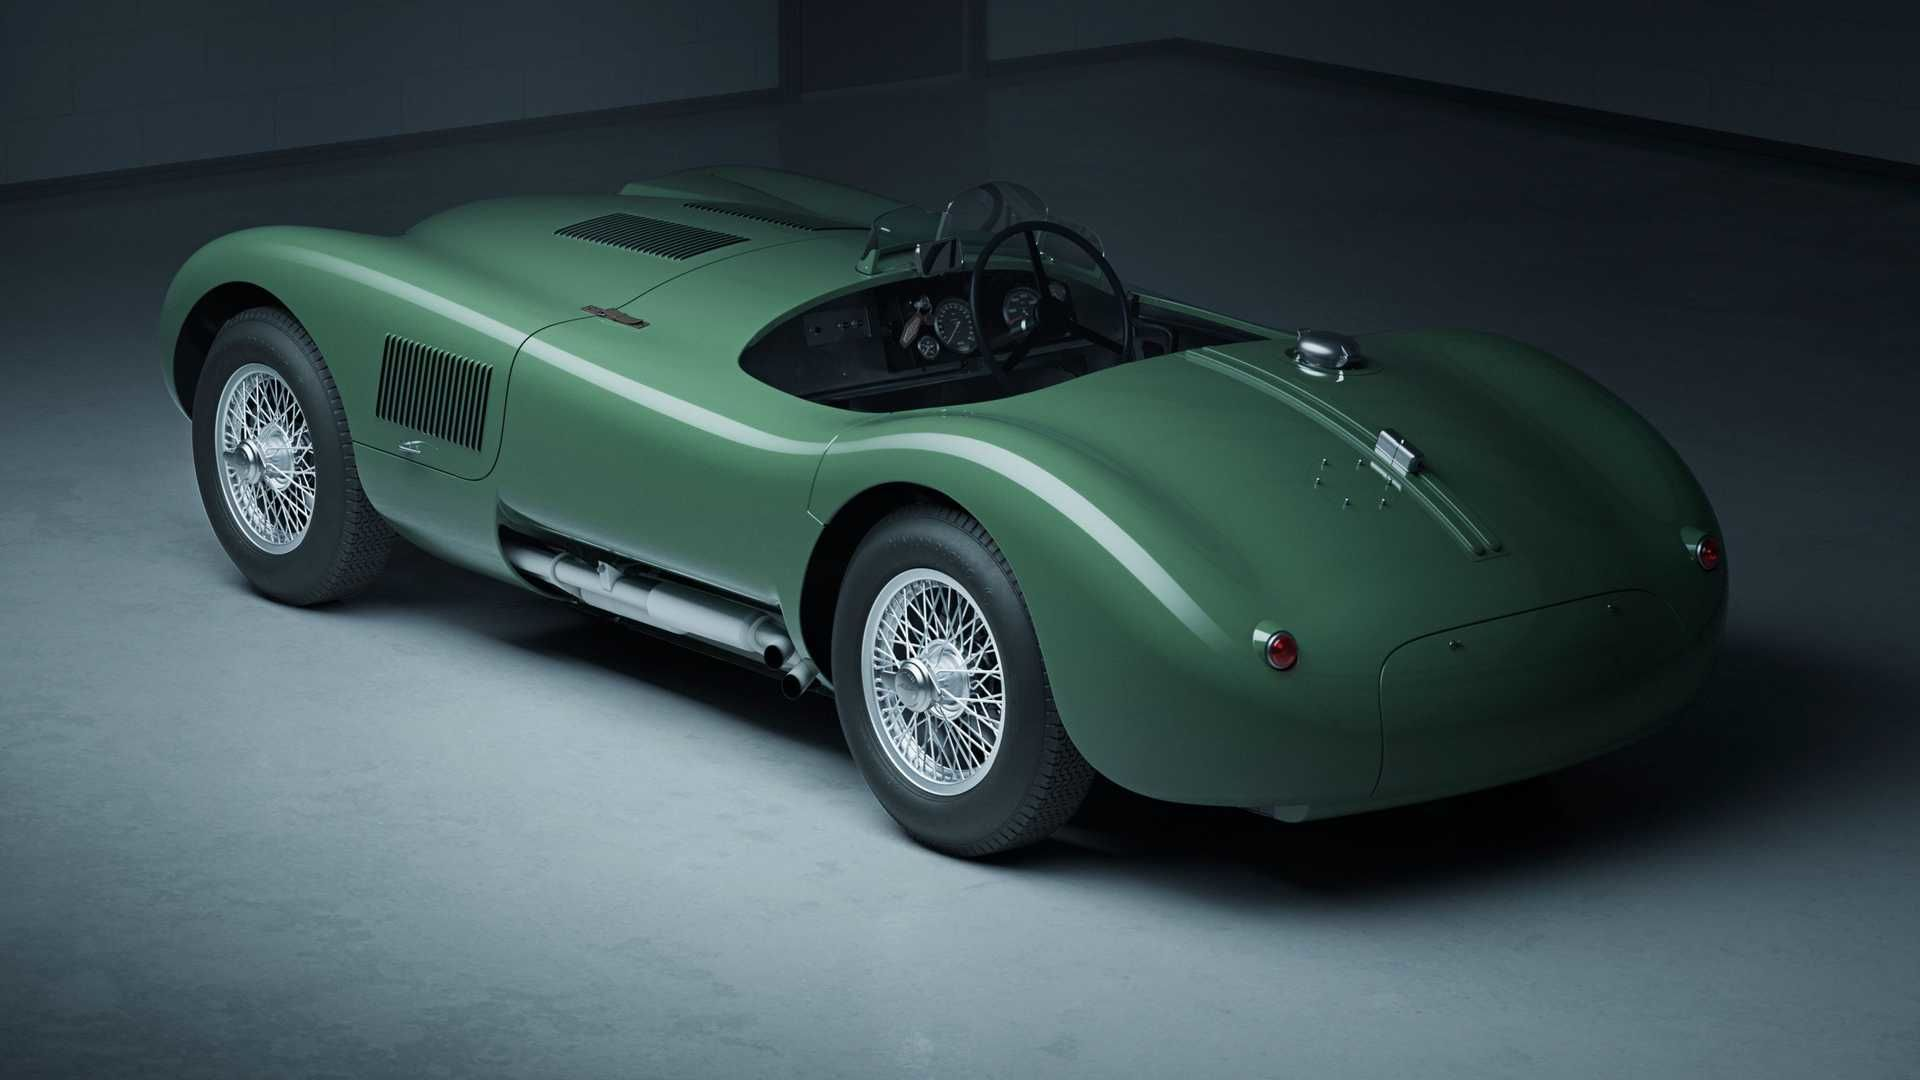 復刻版 Jaguar C-Type Continuation 依舊吸睛